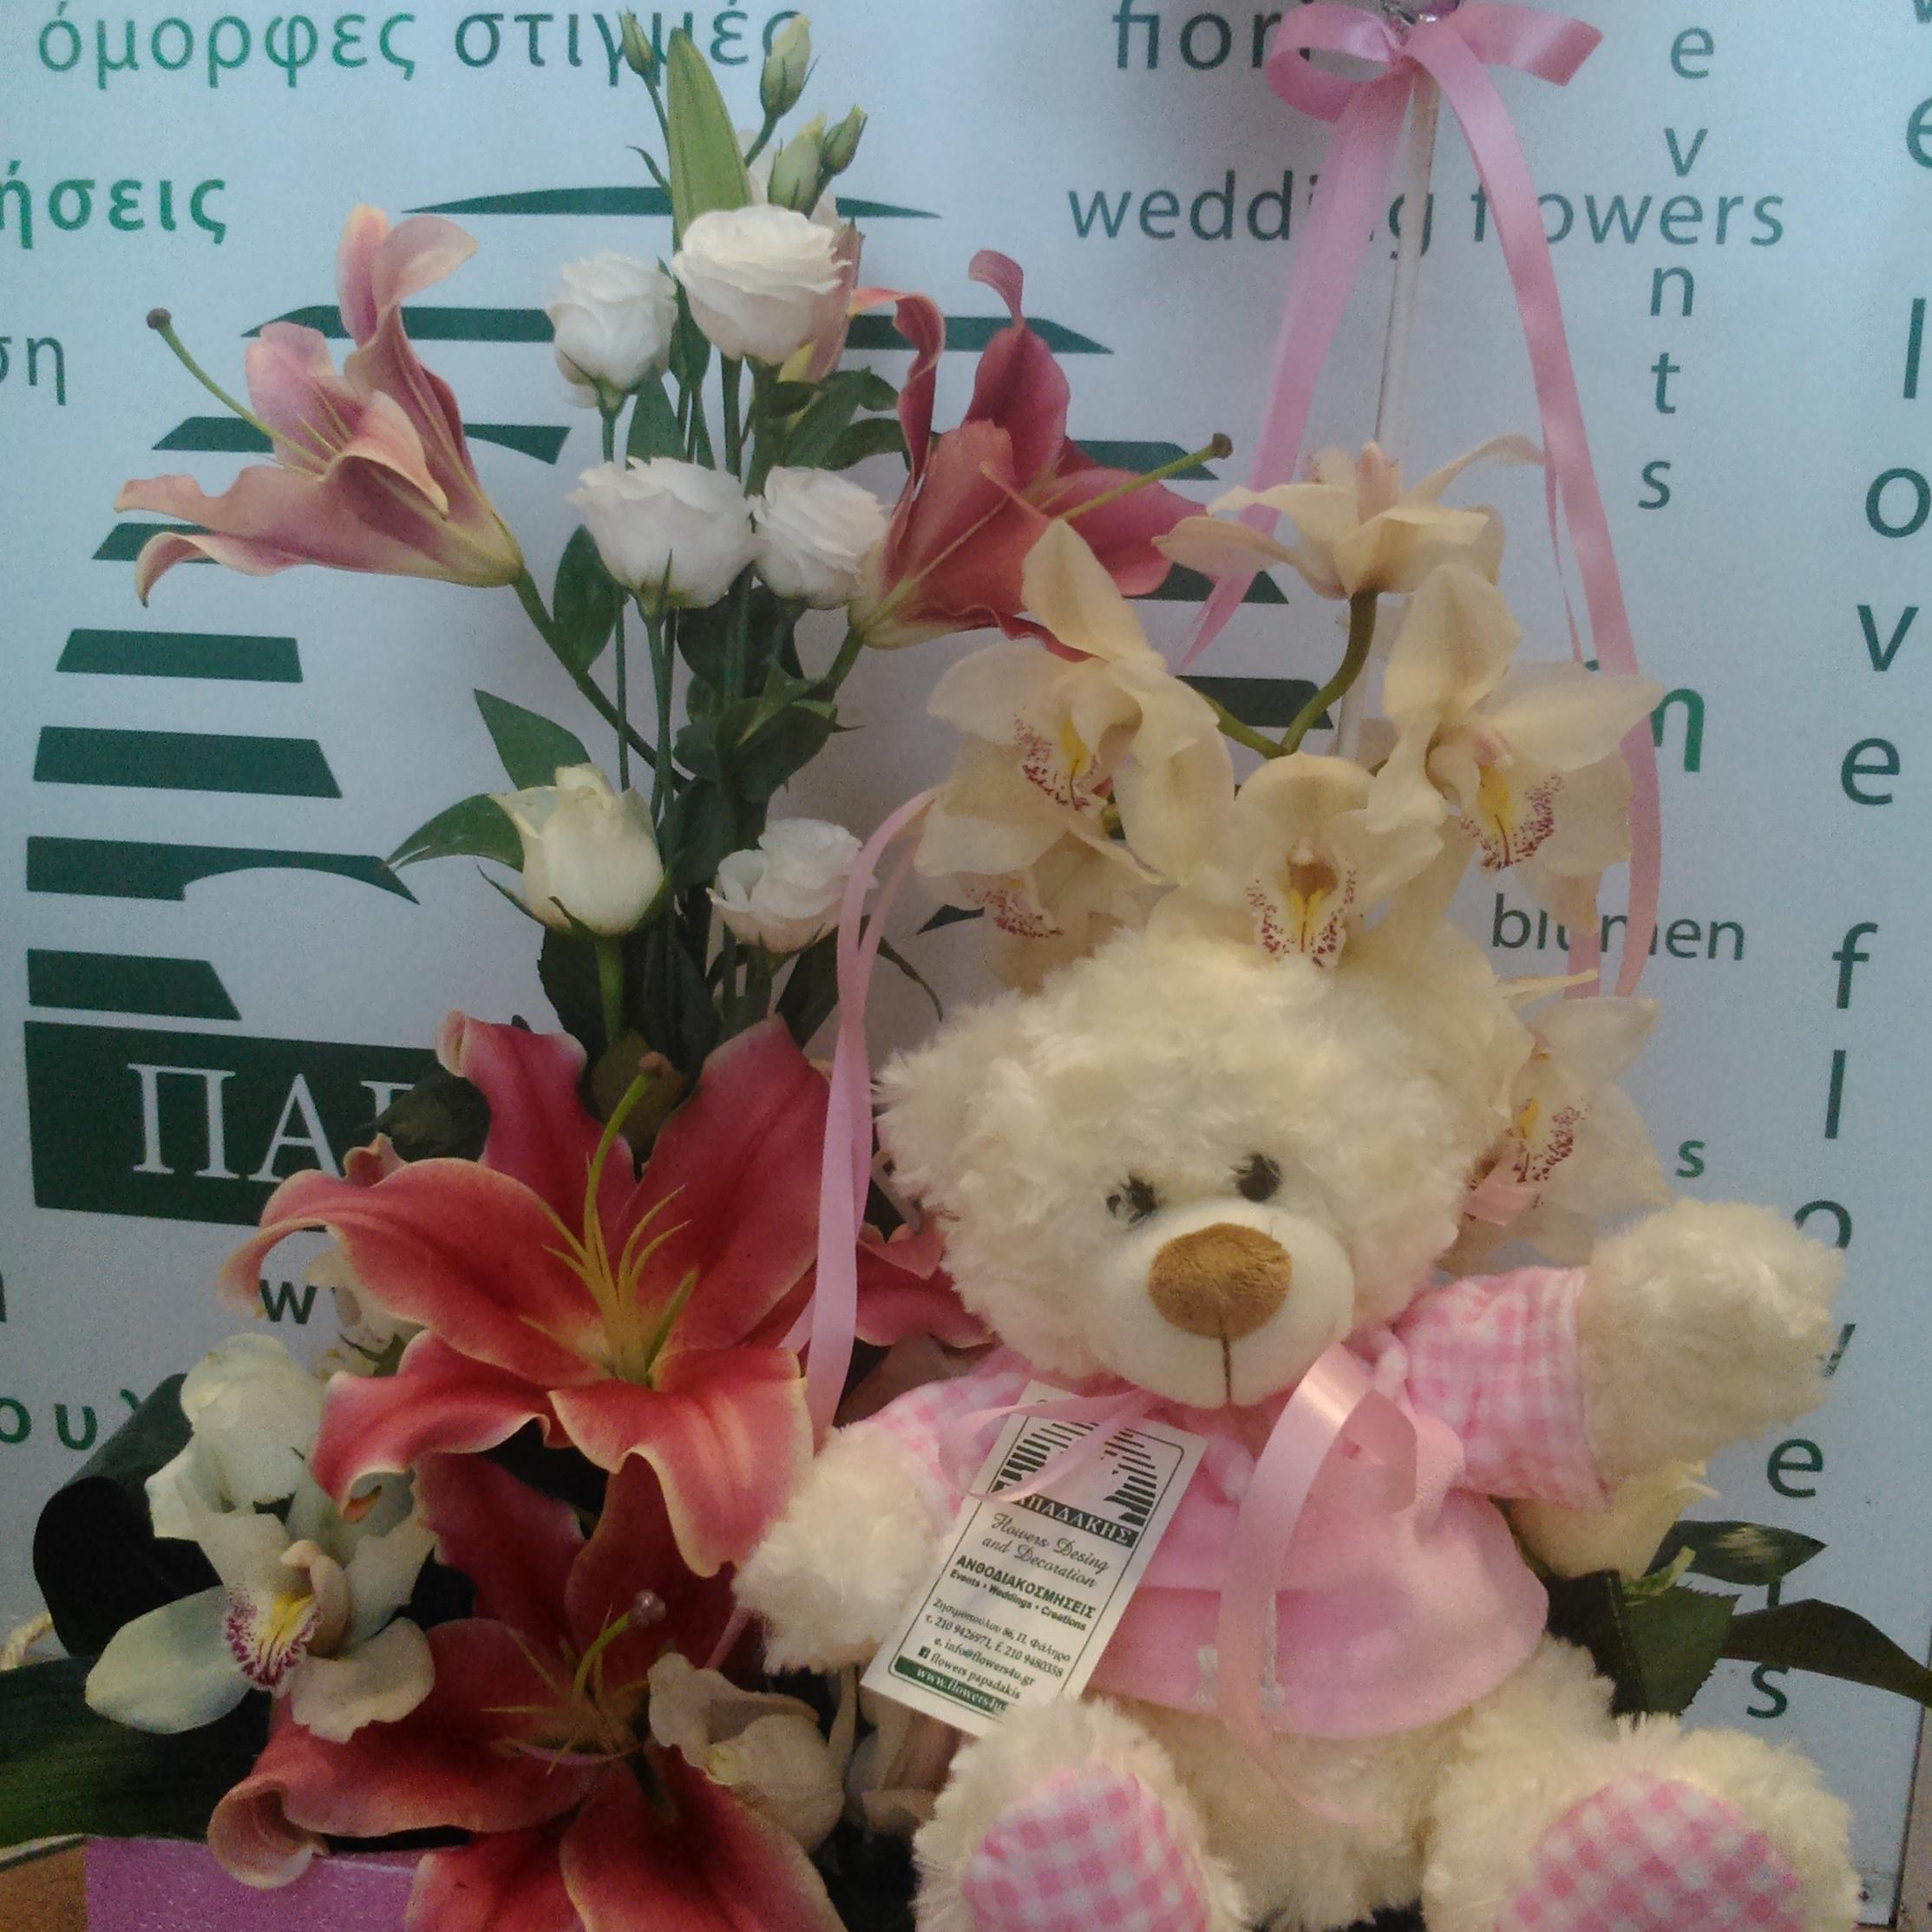 IT S GREAT GIRL!καλάθι με άνθη για νεογέννητο κοριτσάκι d6fdfe2eb61